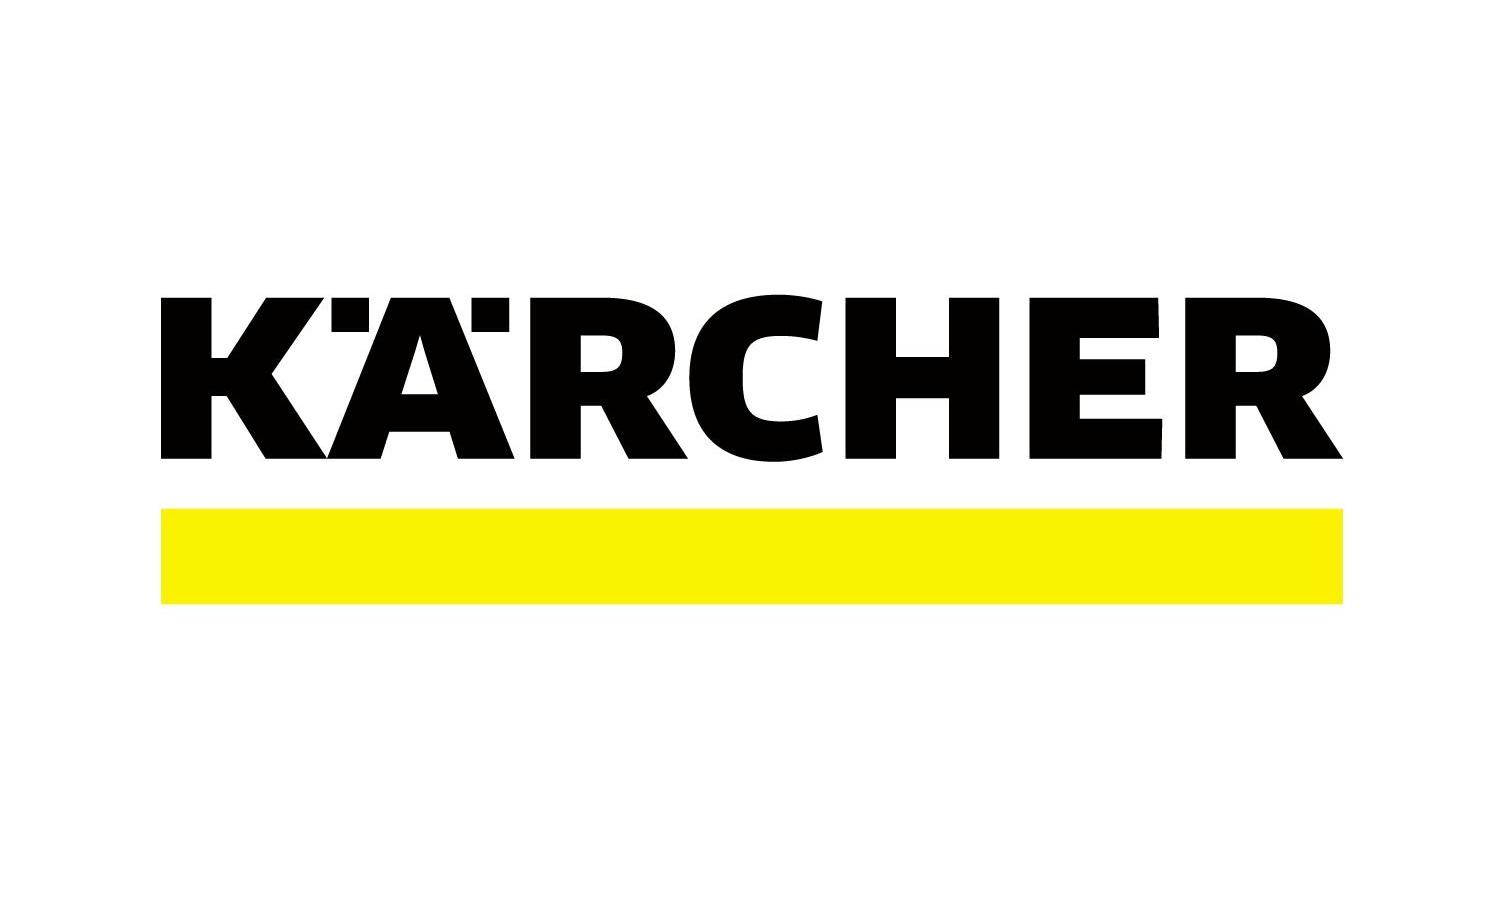 Kaercher_Logo_2015_4C-87815-300DPI